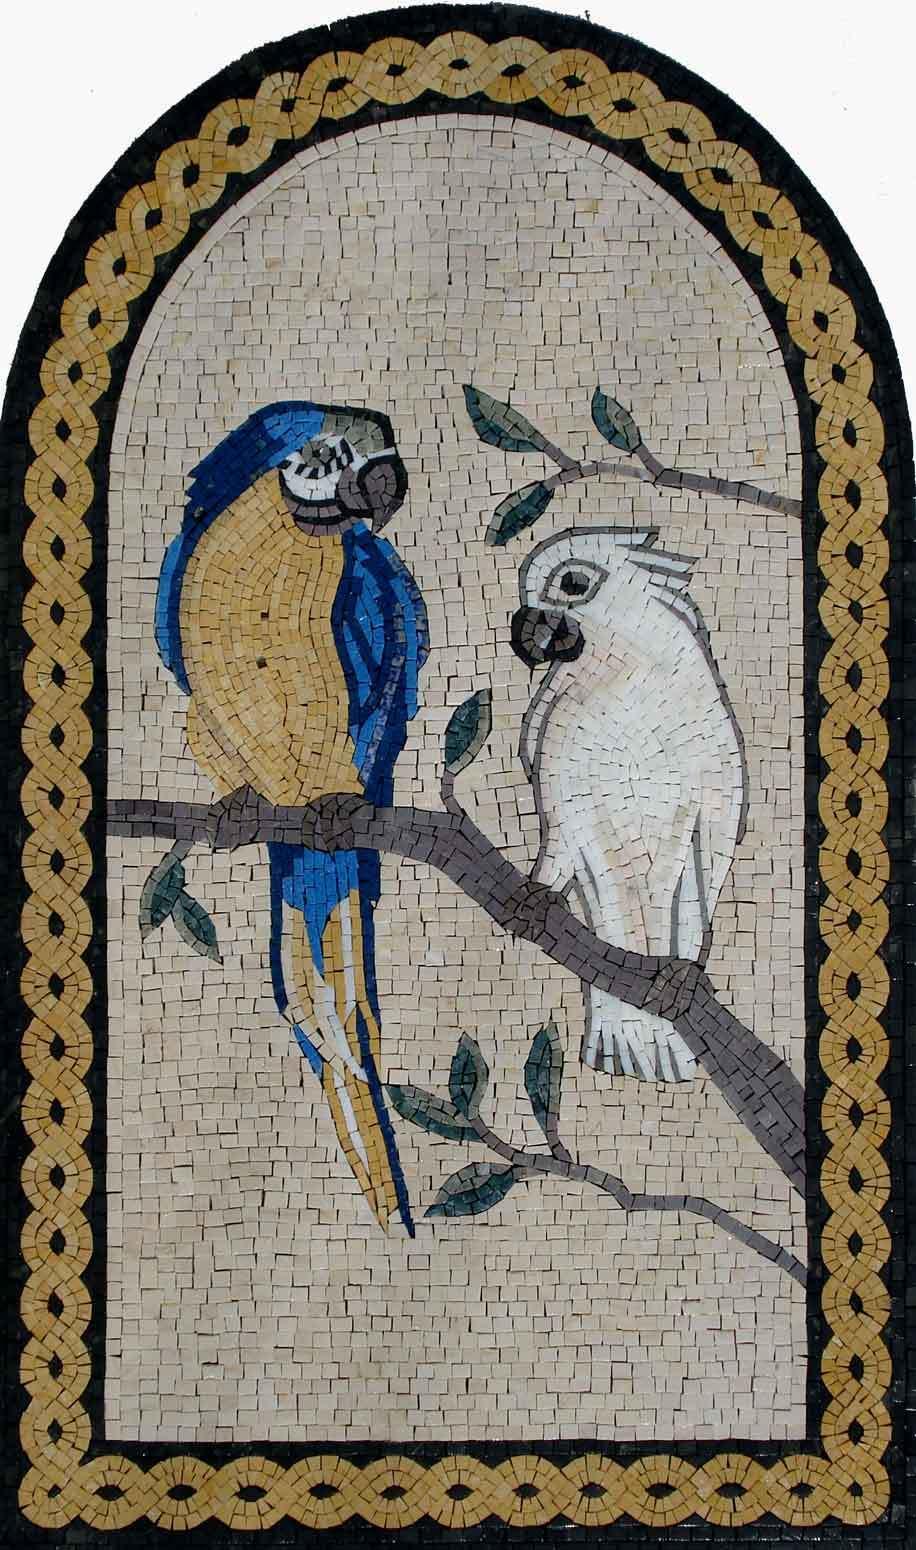 36 x 22  Handmade Two Parreds Arbor Tree Garden Nature Decor Art Marble Mosaic